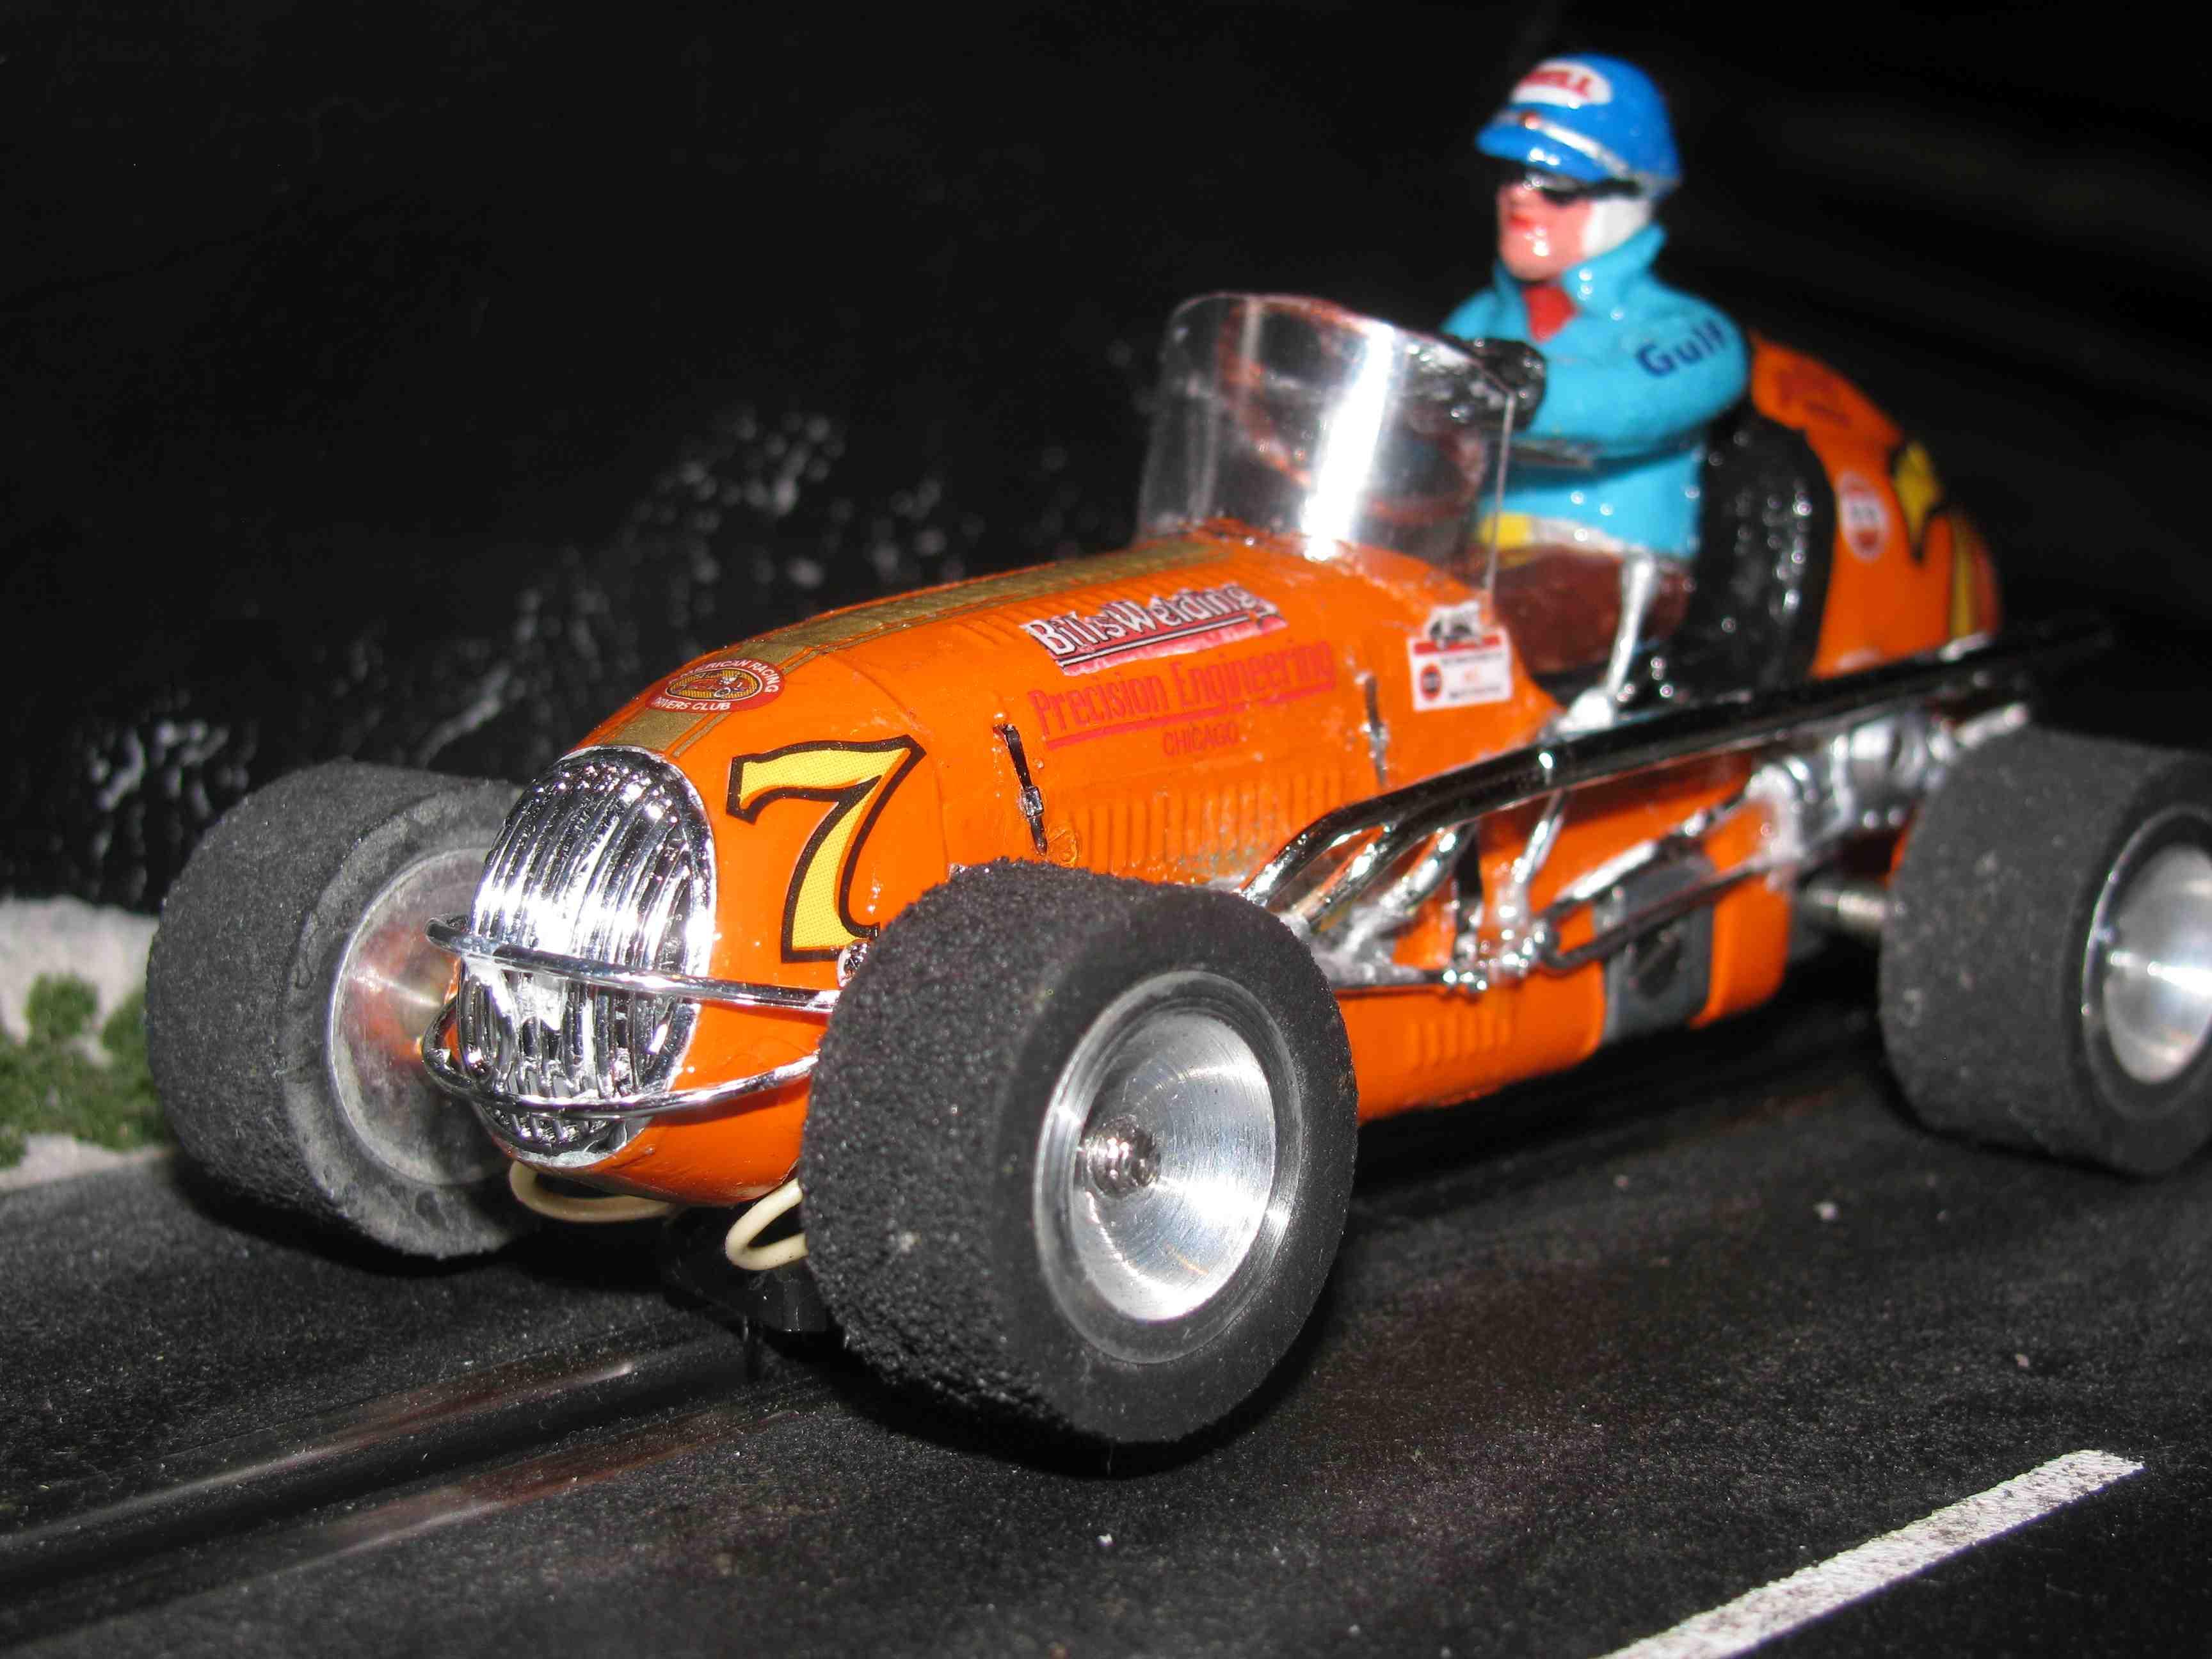 "* SOLD * Vintage Revell Midget Racer ""Bills Welding & Precision Engineering"" Slot Car 1/32 Scale – Orange – Car #7"